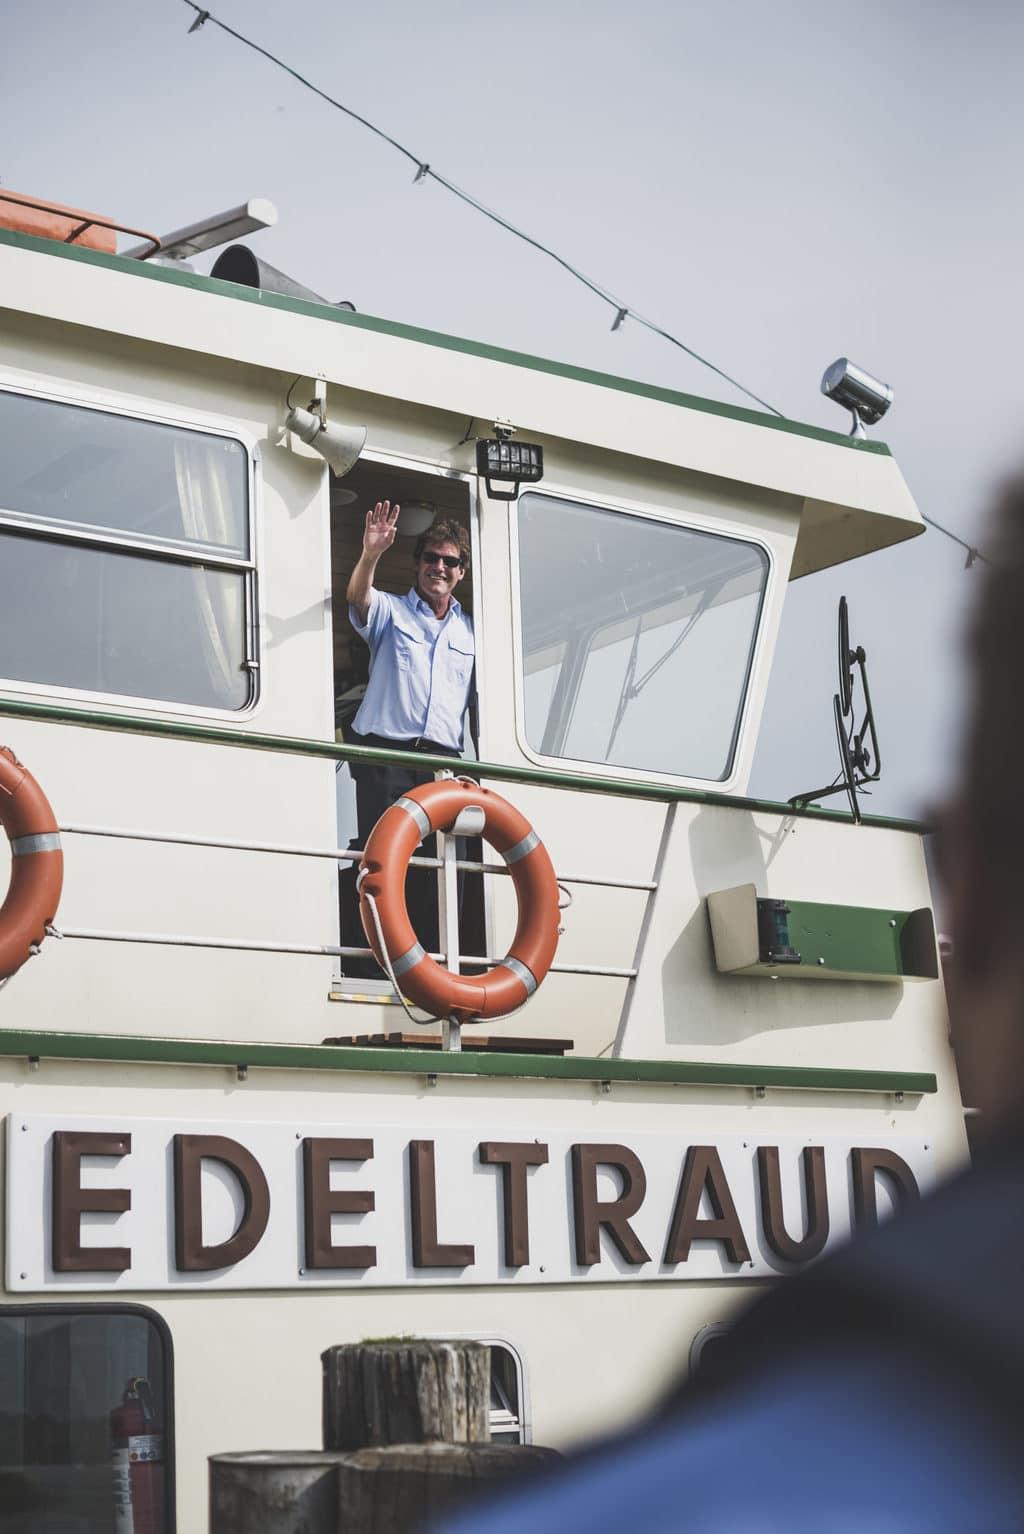 Kapitein Otto Strasser zwaait vanaf zijn boot Edeltraut op de Chiemsee